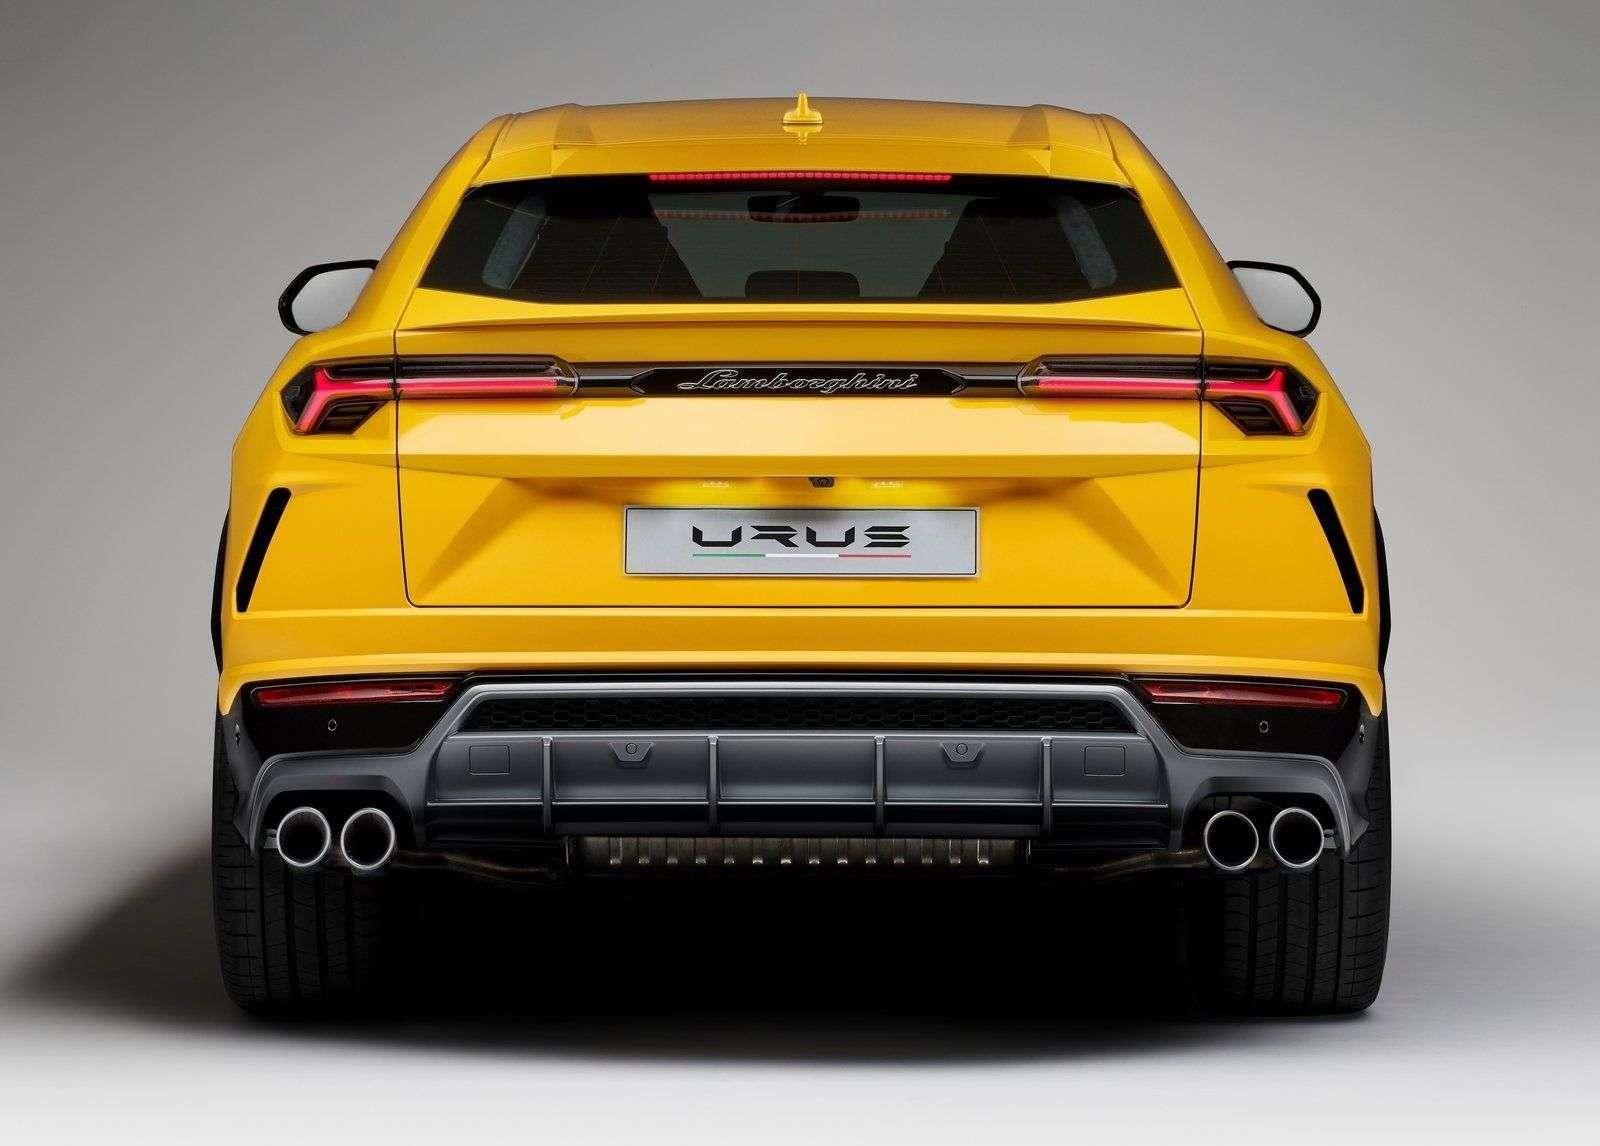 Обзор кроссовера Lamborghini Urus 2019